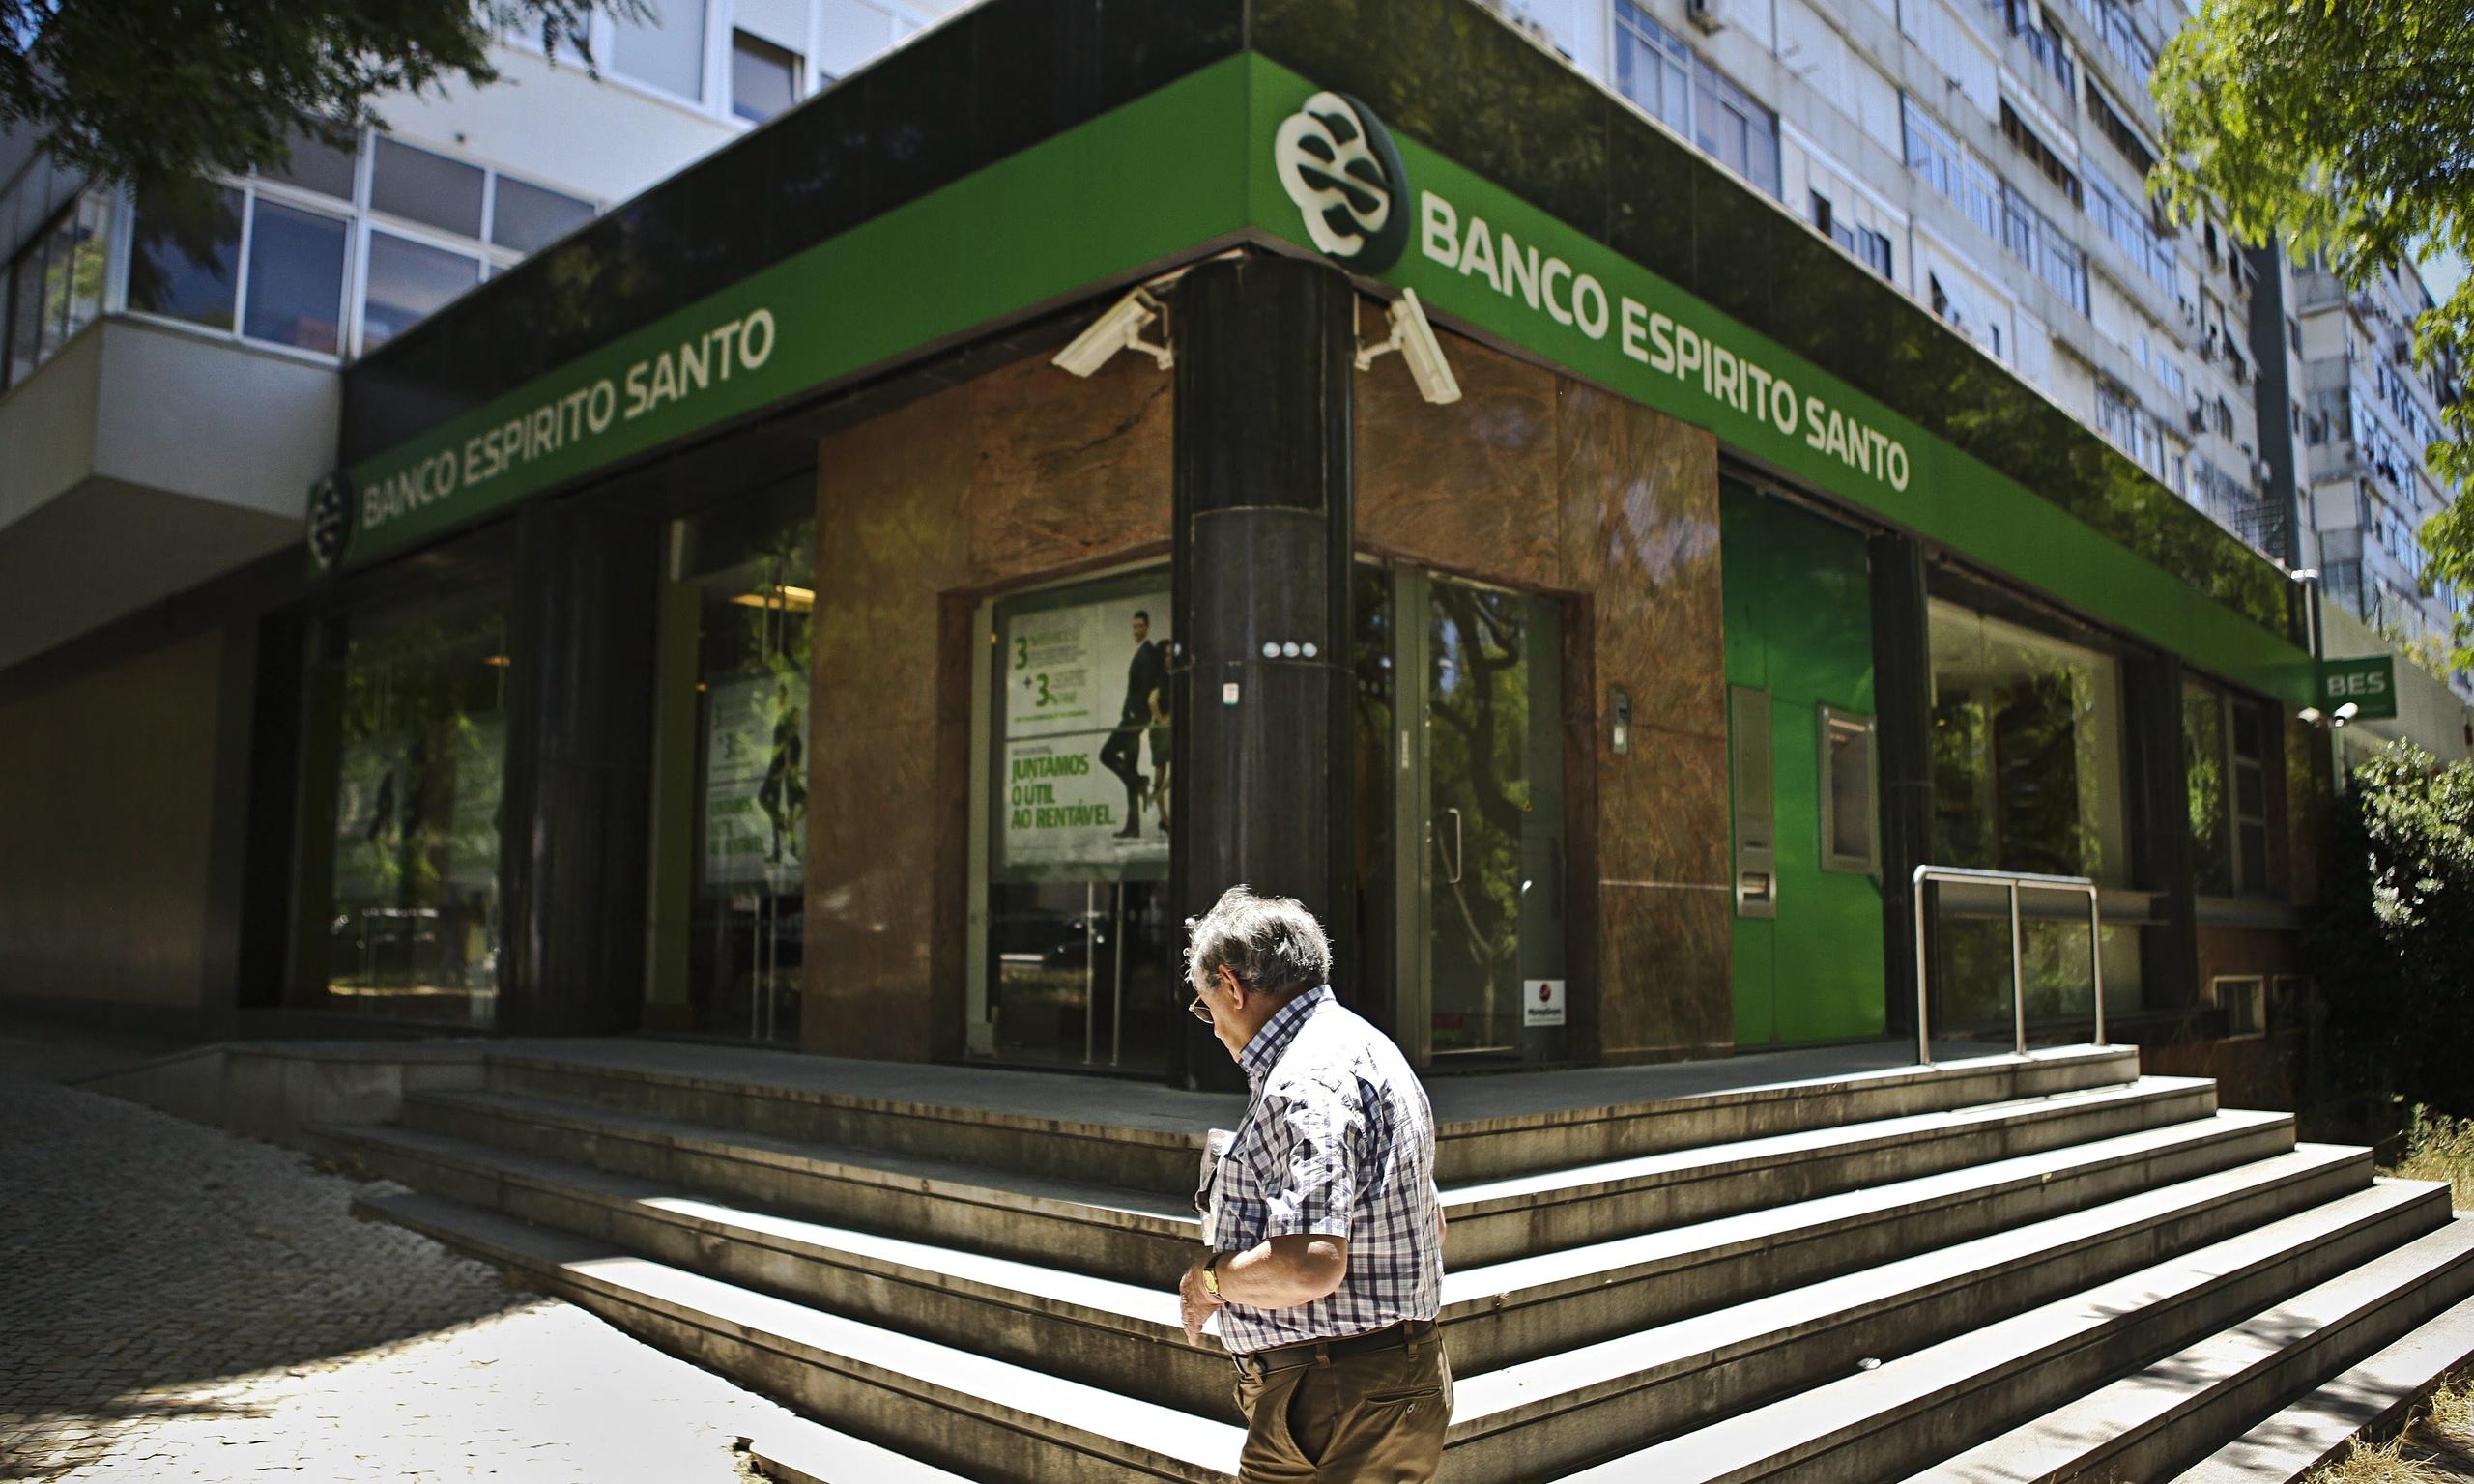 Banco Espirito Santo shares suspended